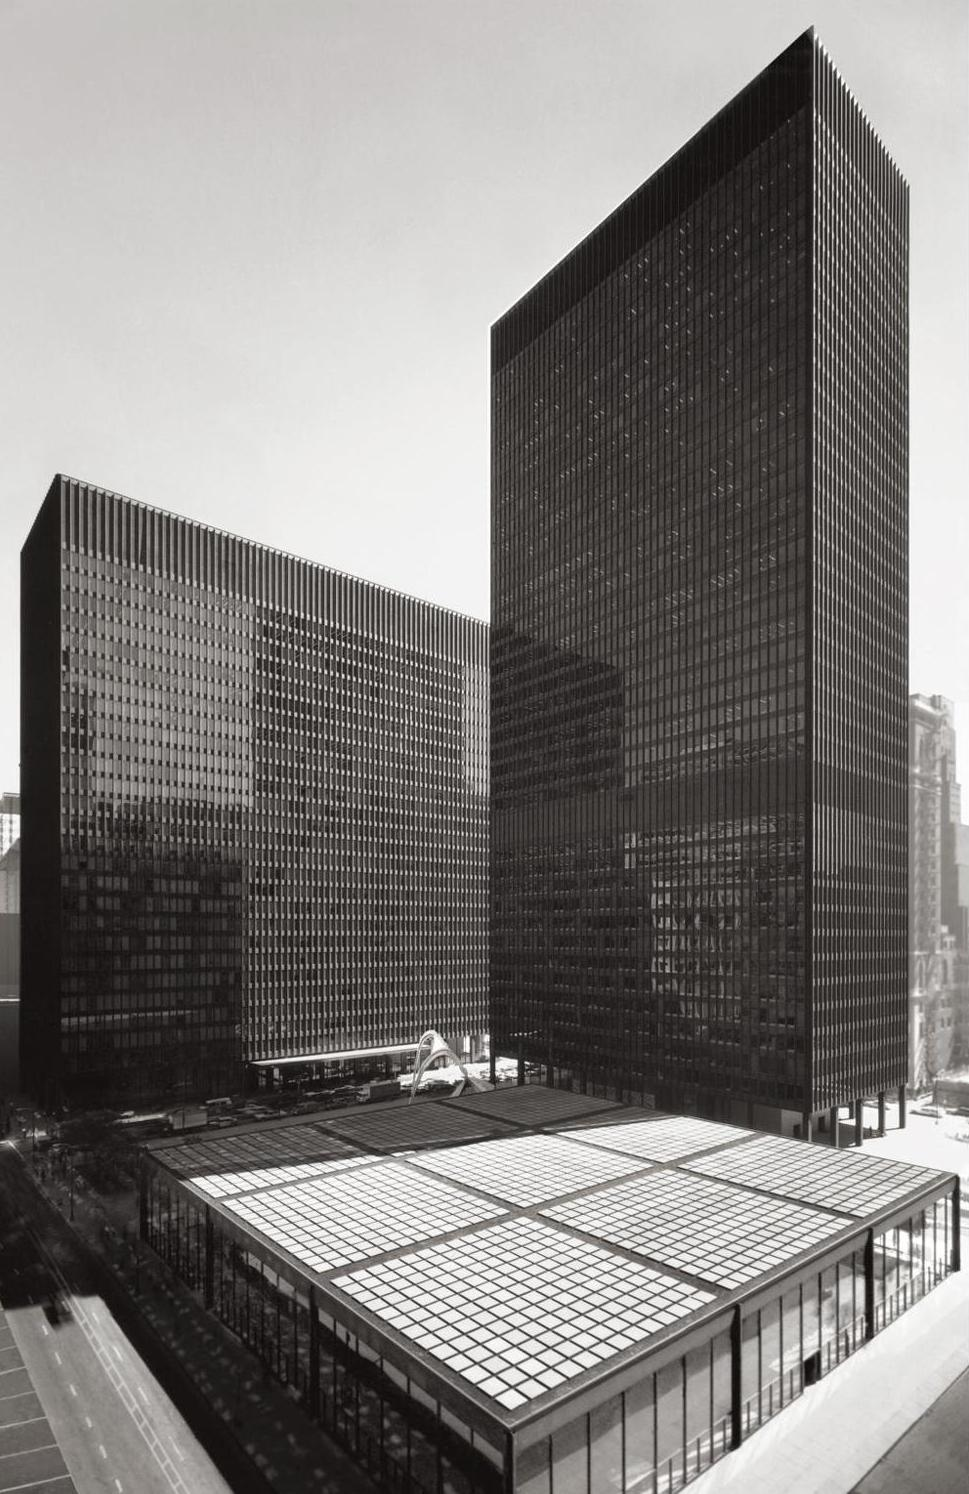 Chicago Mies Van Der Rohe Tour kluczynski federal building - wikipedia